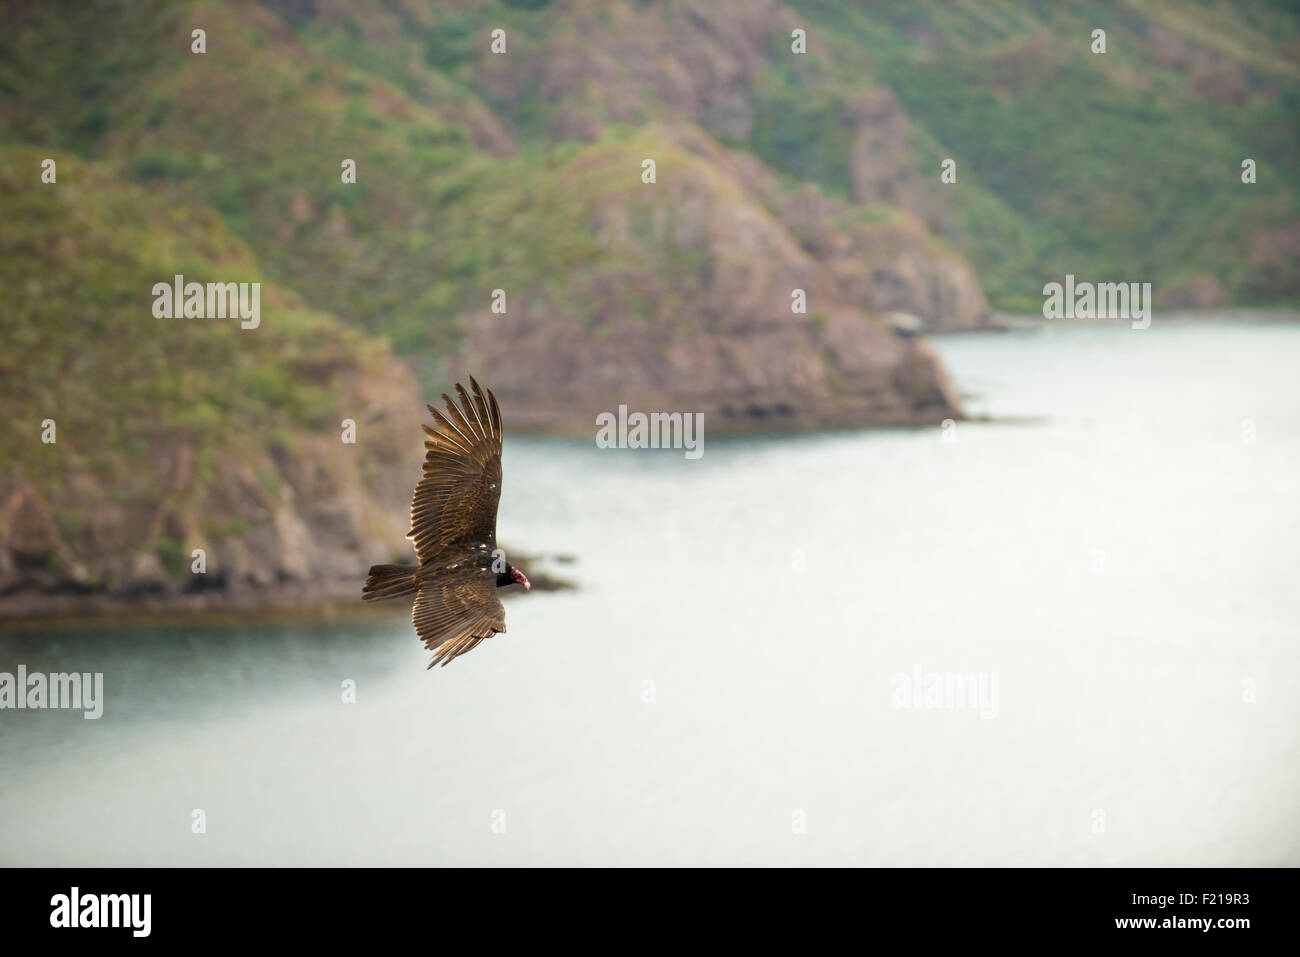 Loreto, Baja, Mexico. Detailed image of a bird soaring through the sky. - Stock Image